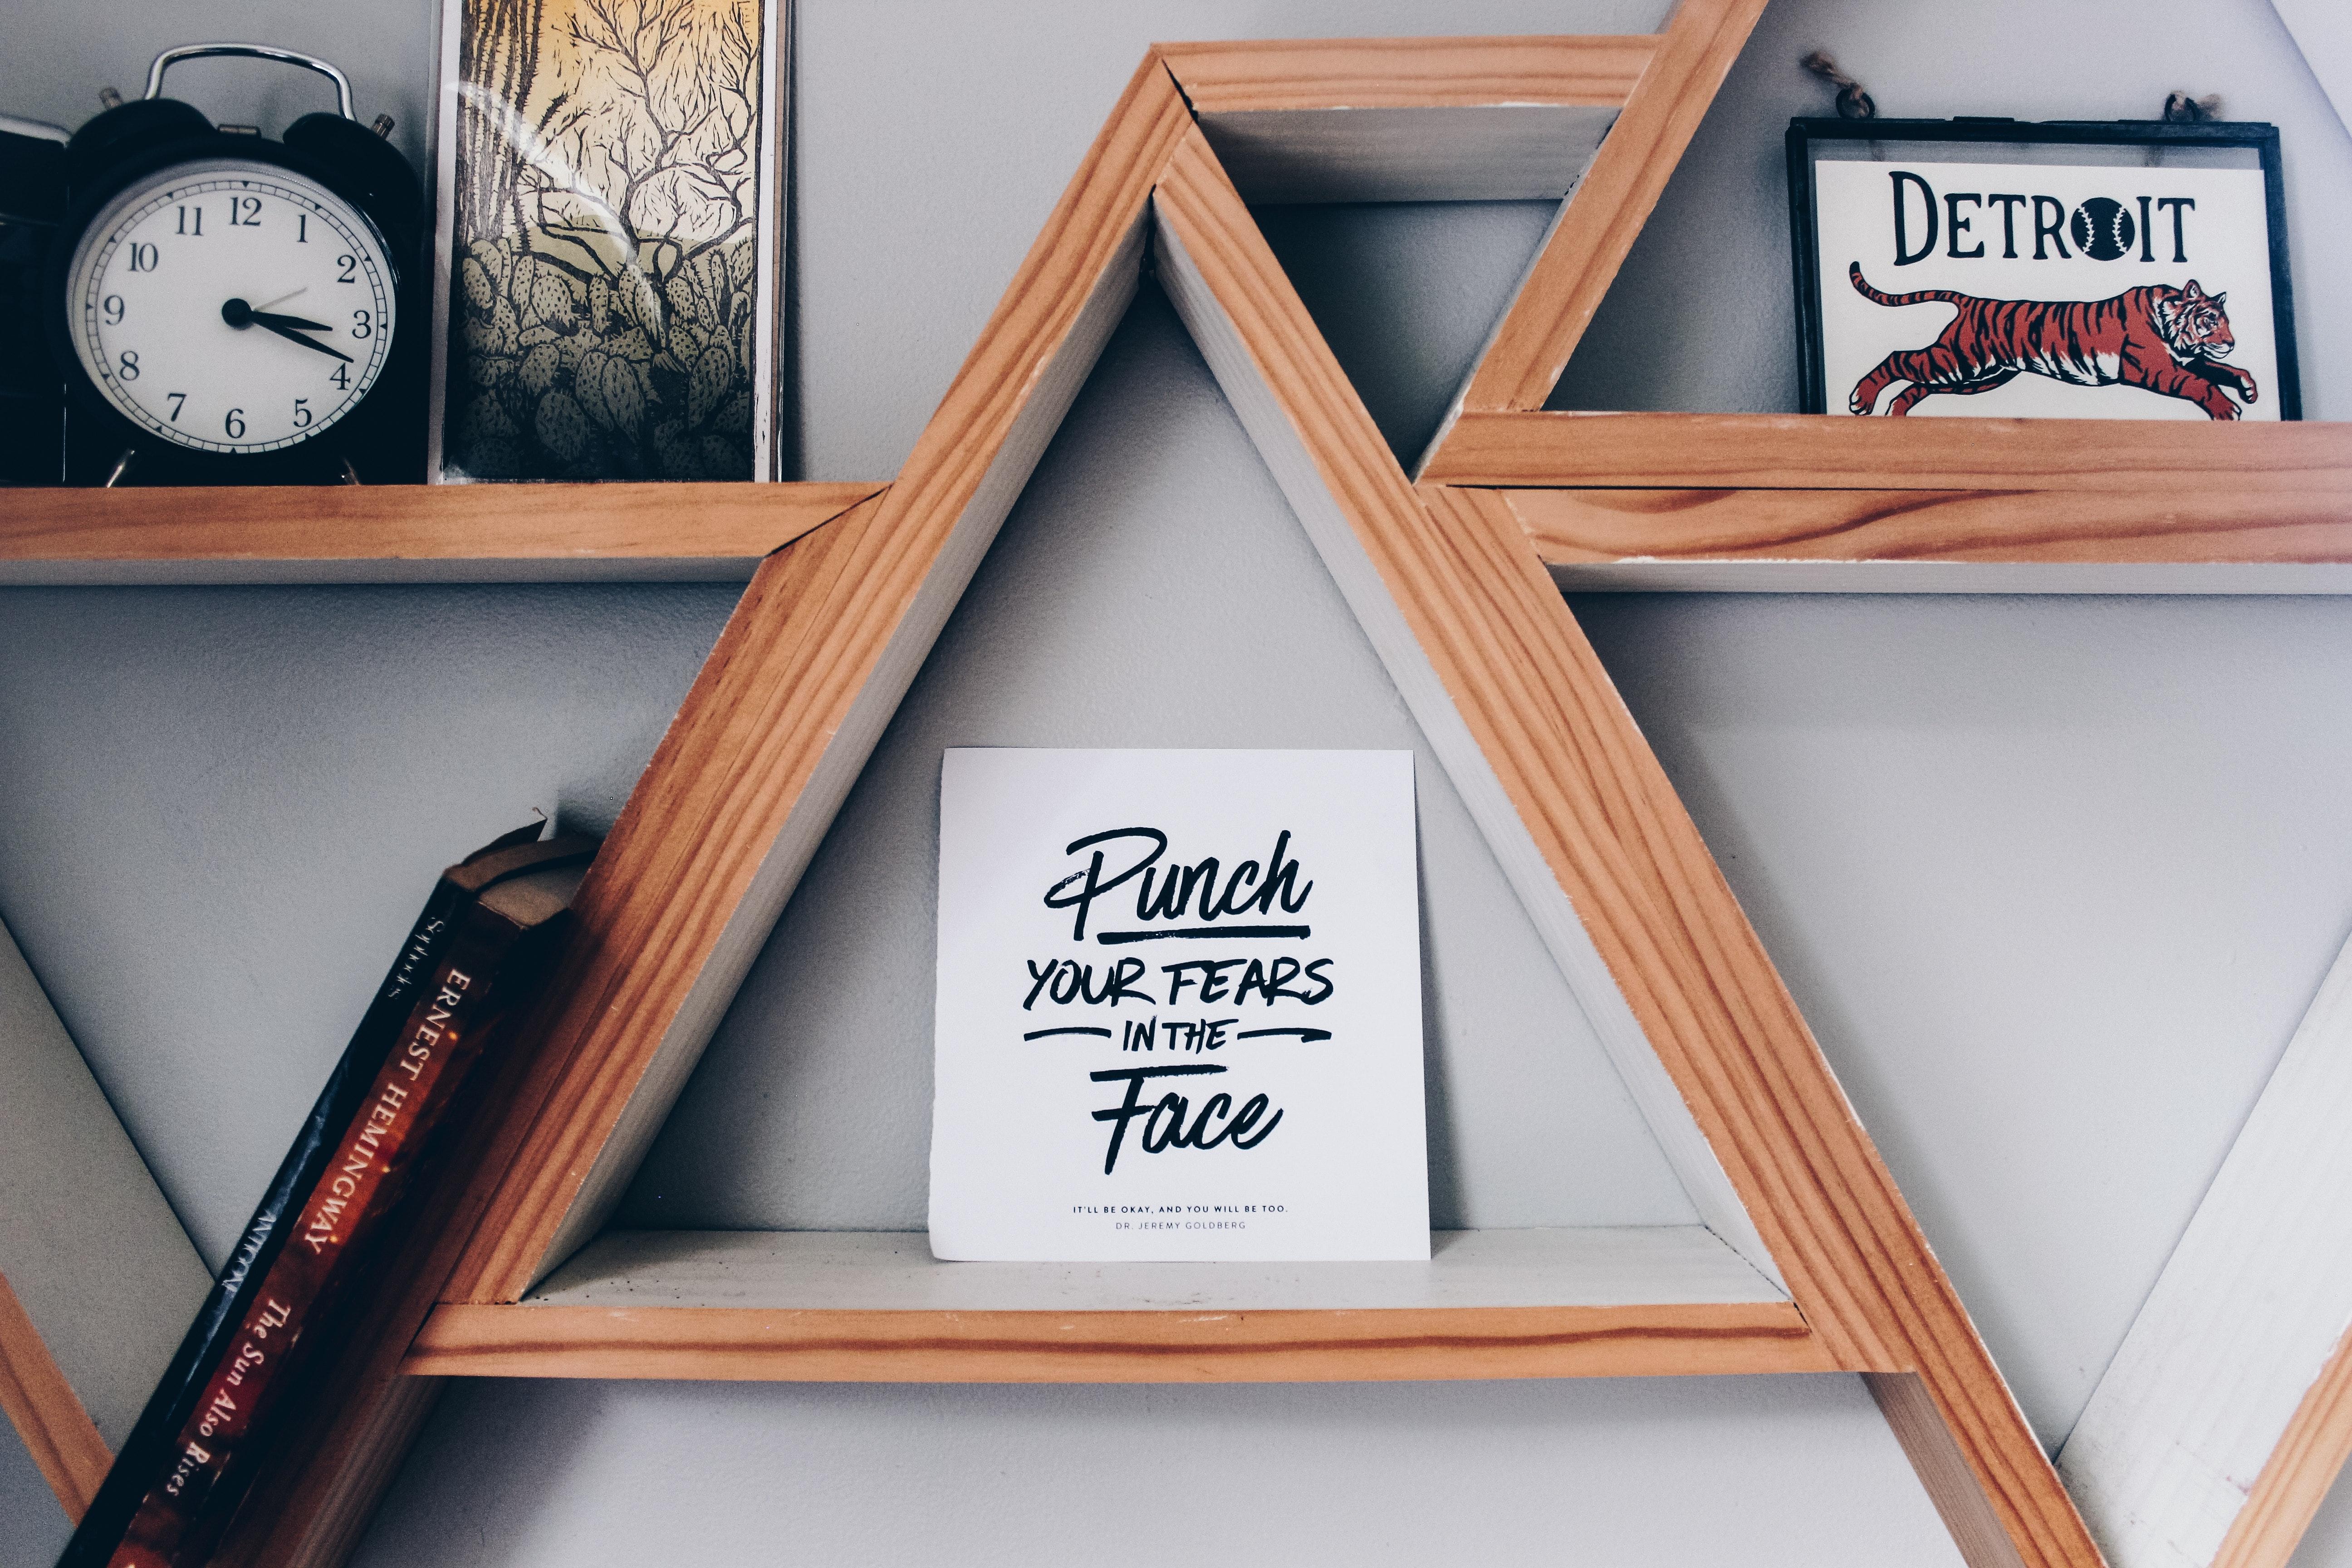 Photo of a card on a triangular shelf